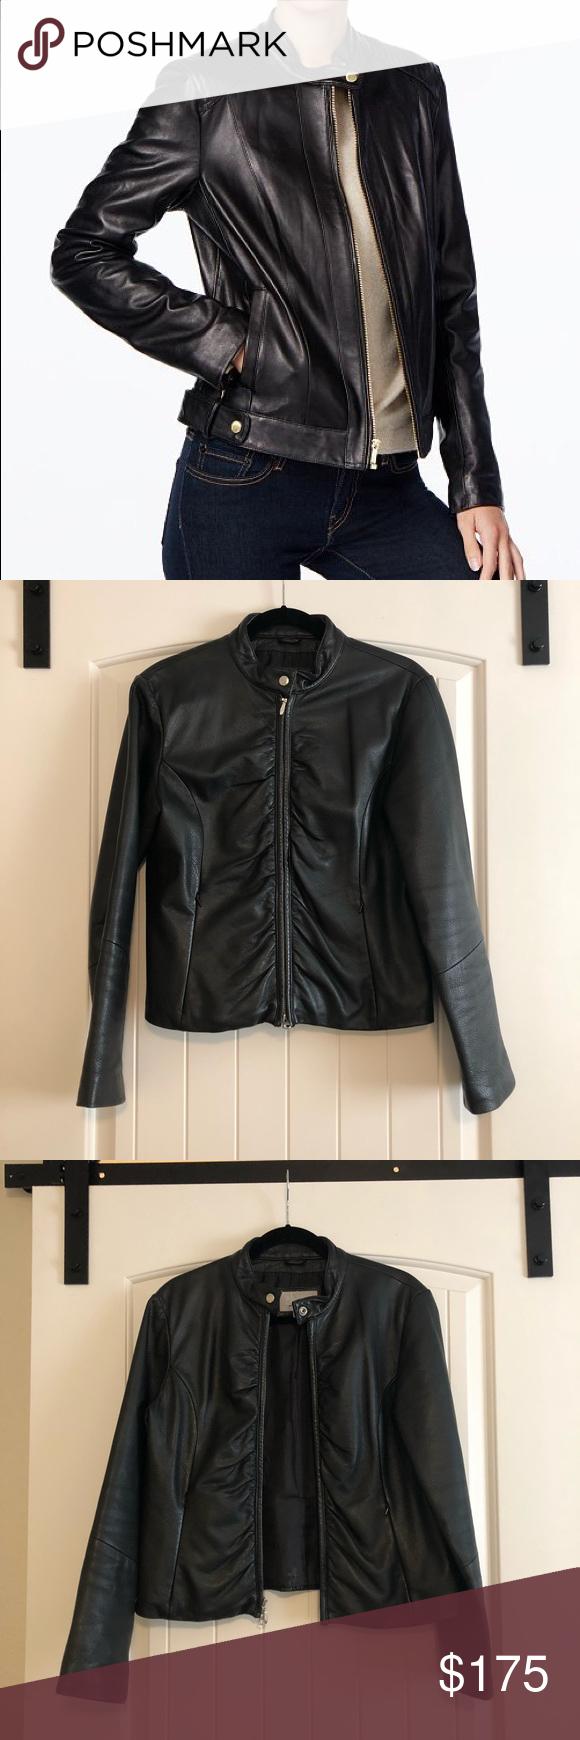 Black Leather Jacket Real Leather Leather jacket